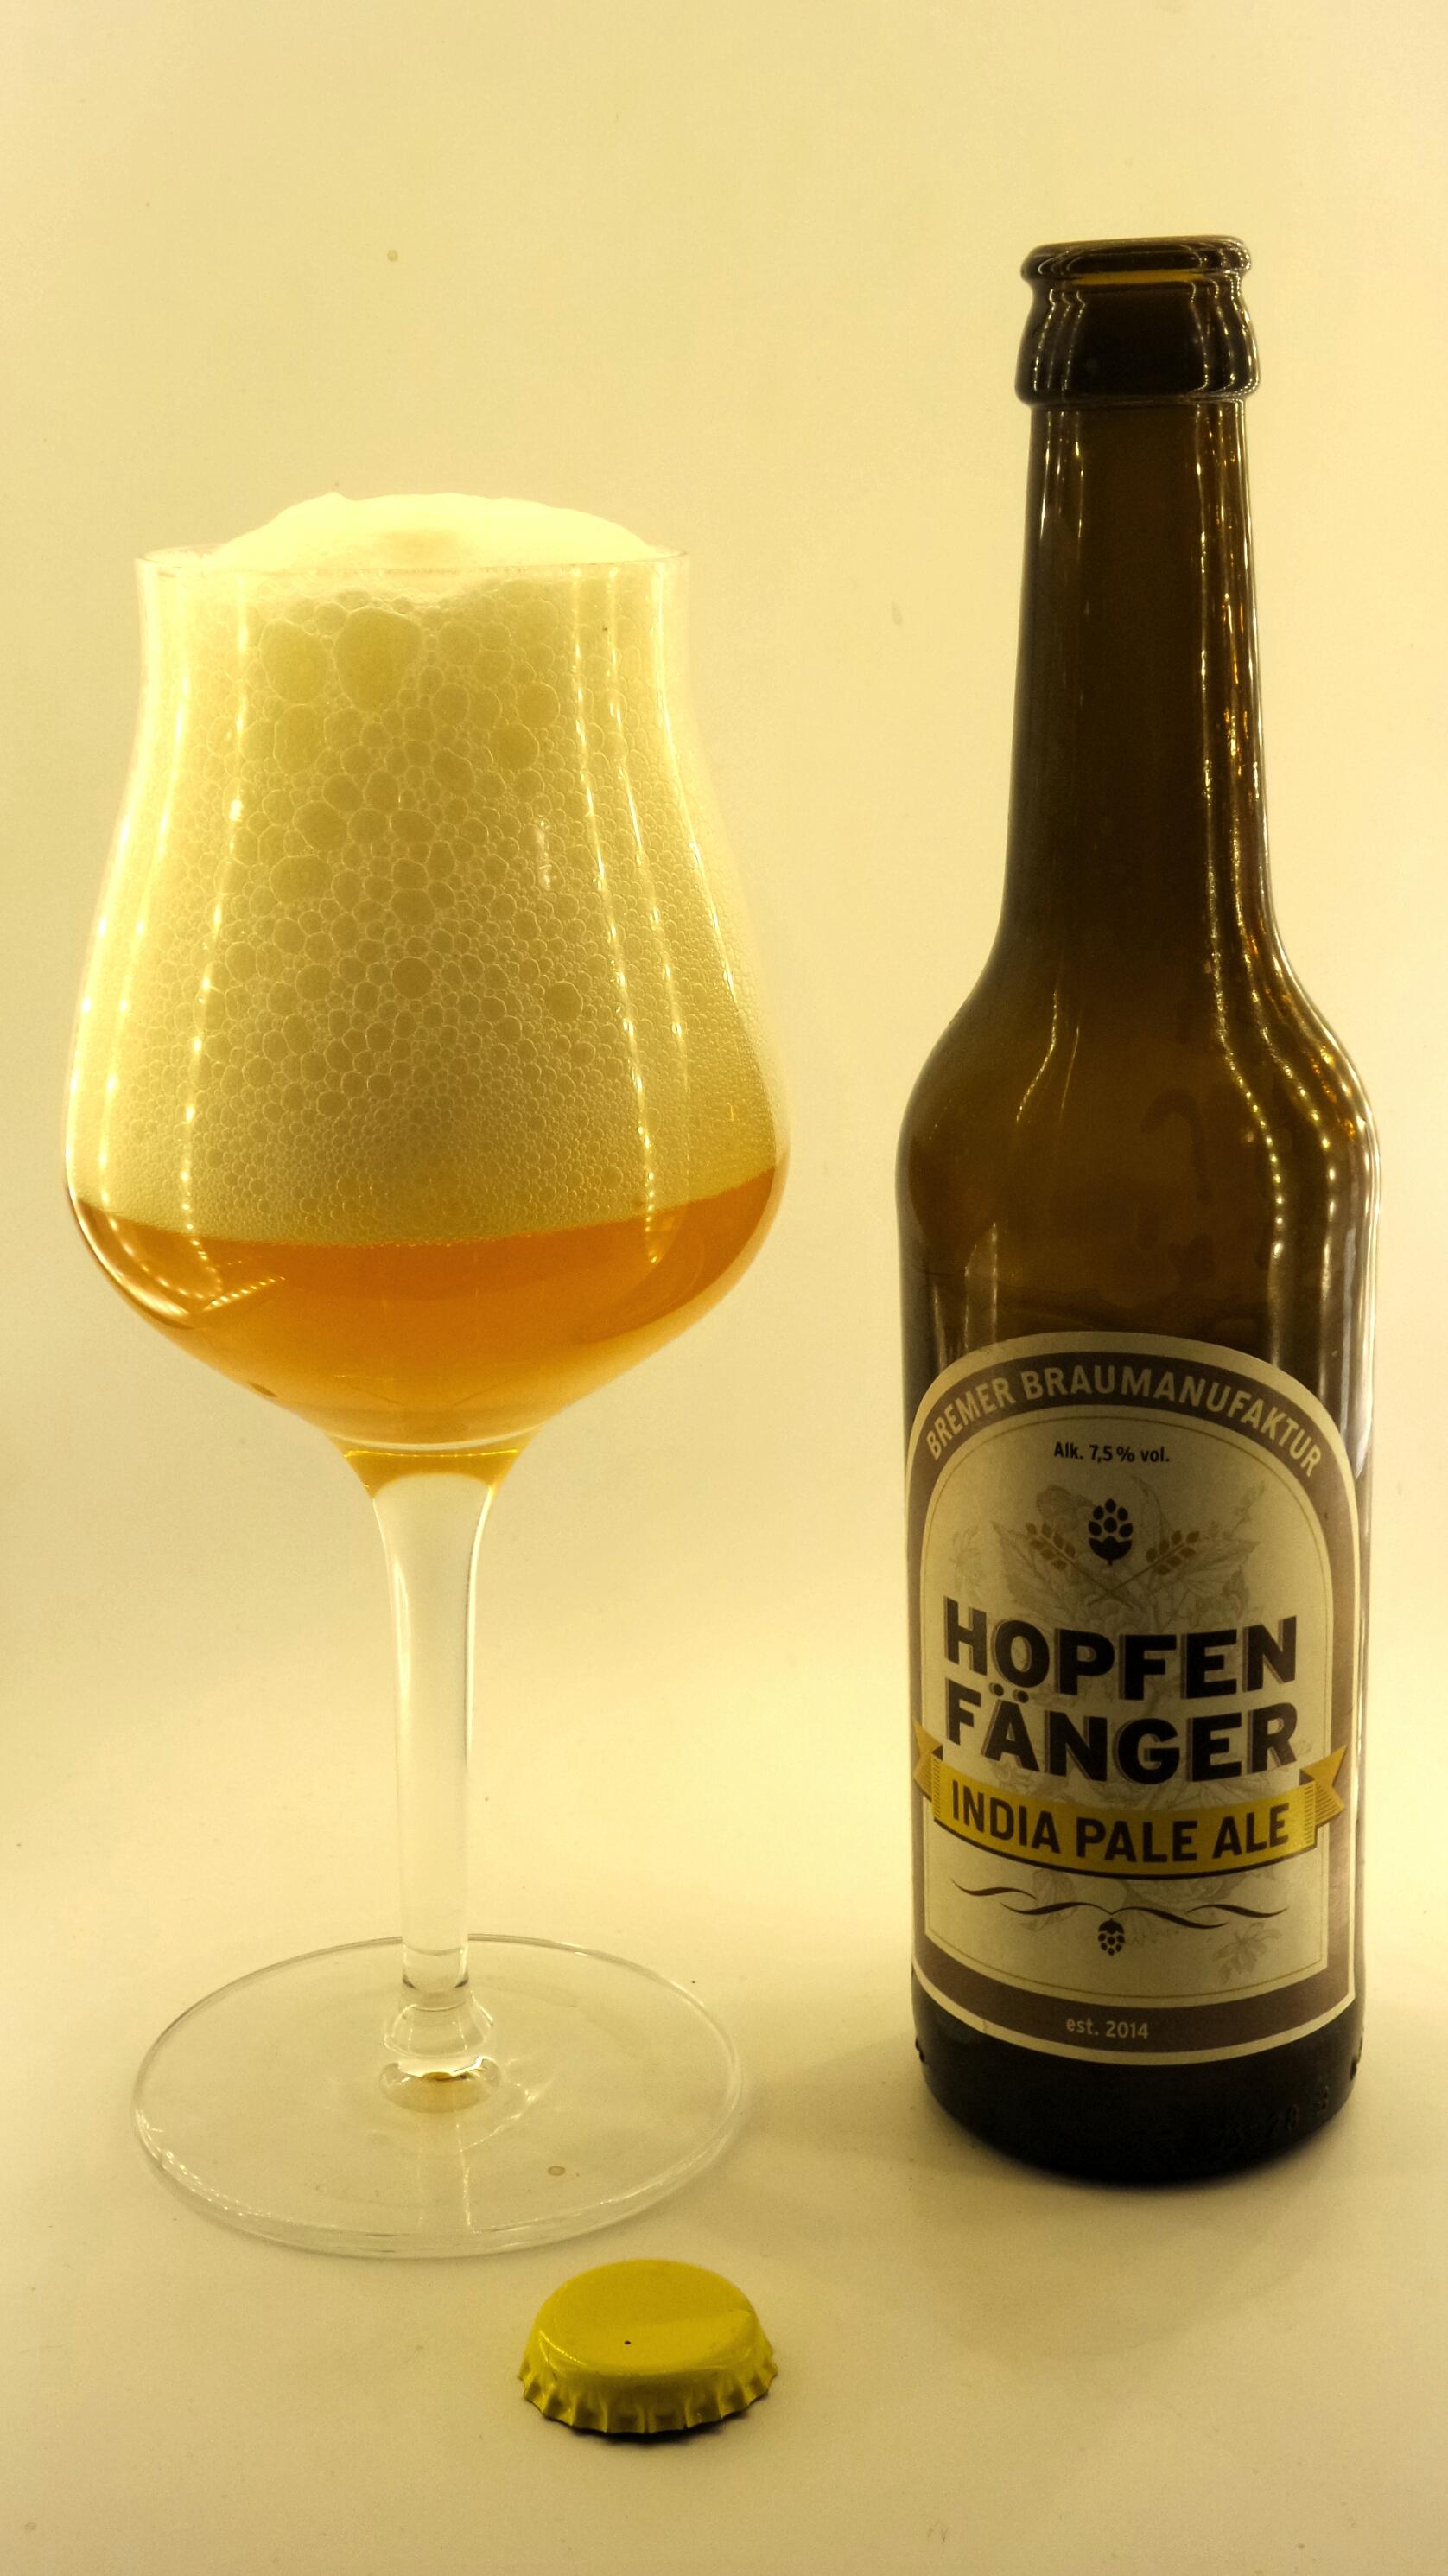 Hopfenfänger India Pale Ale